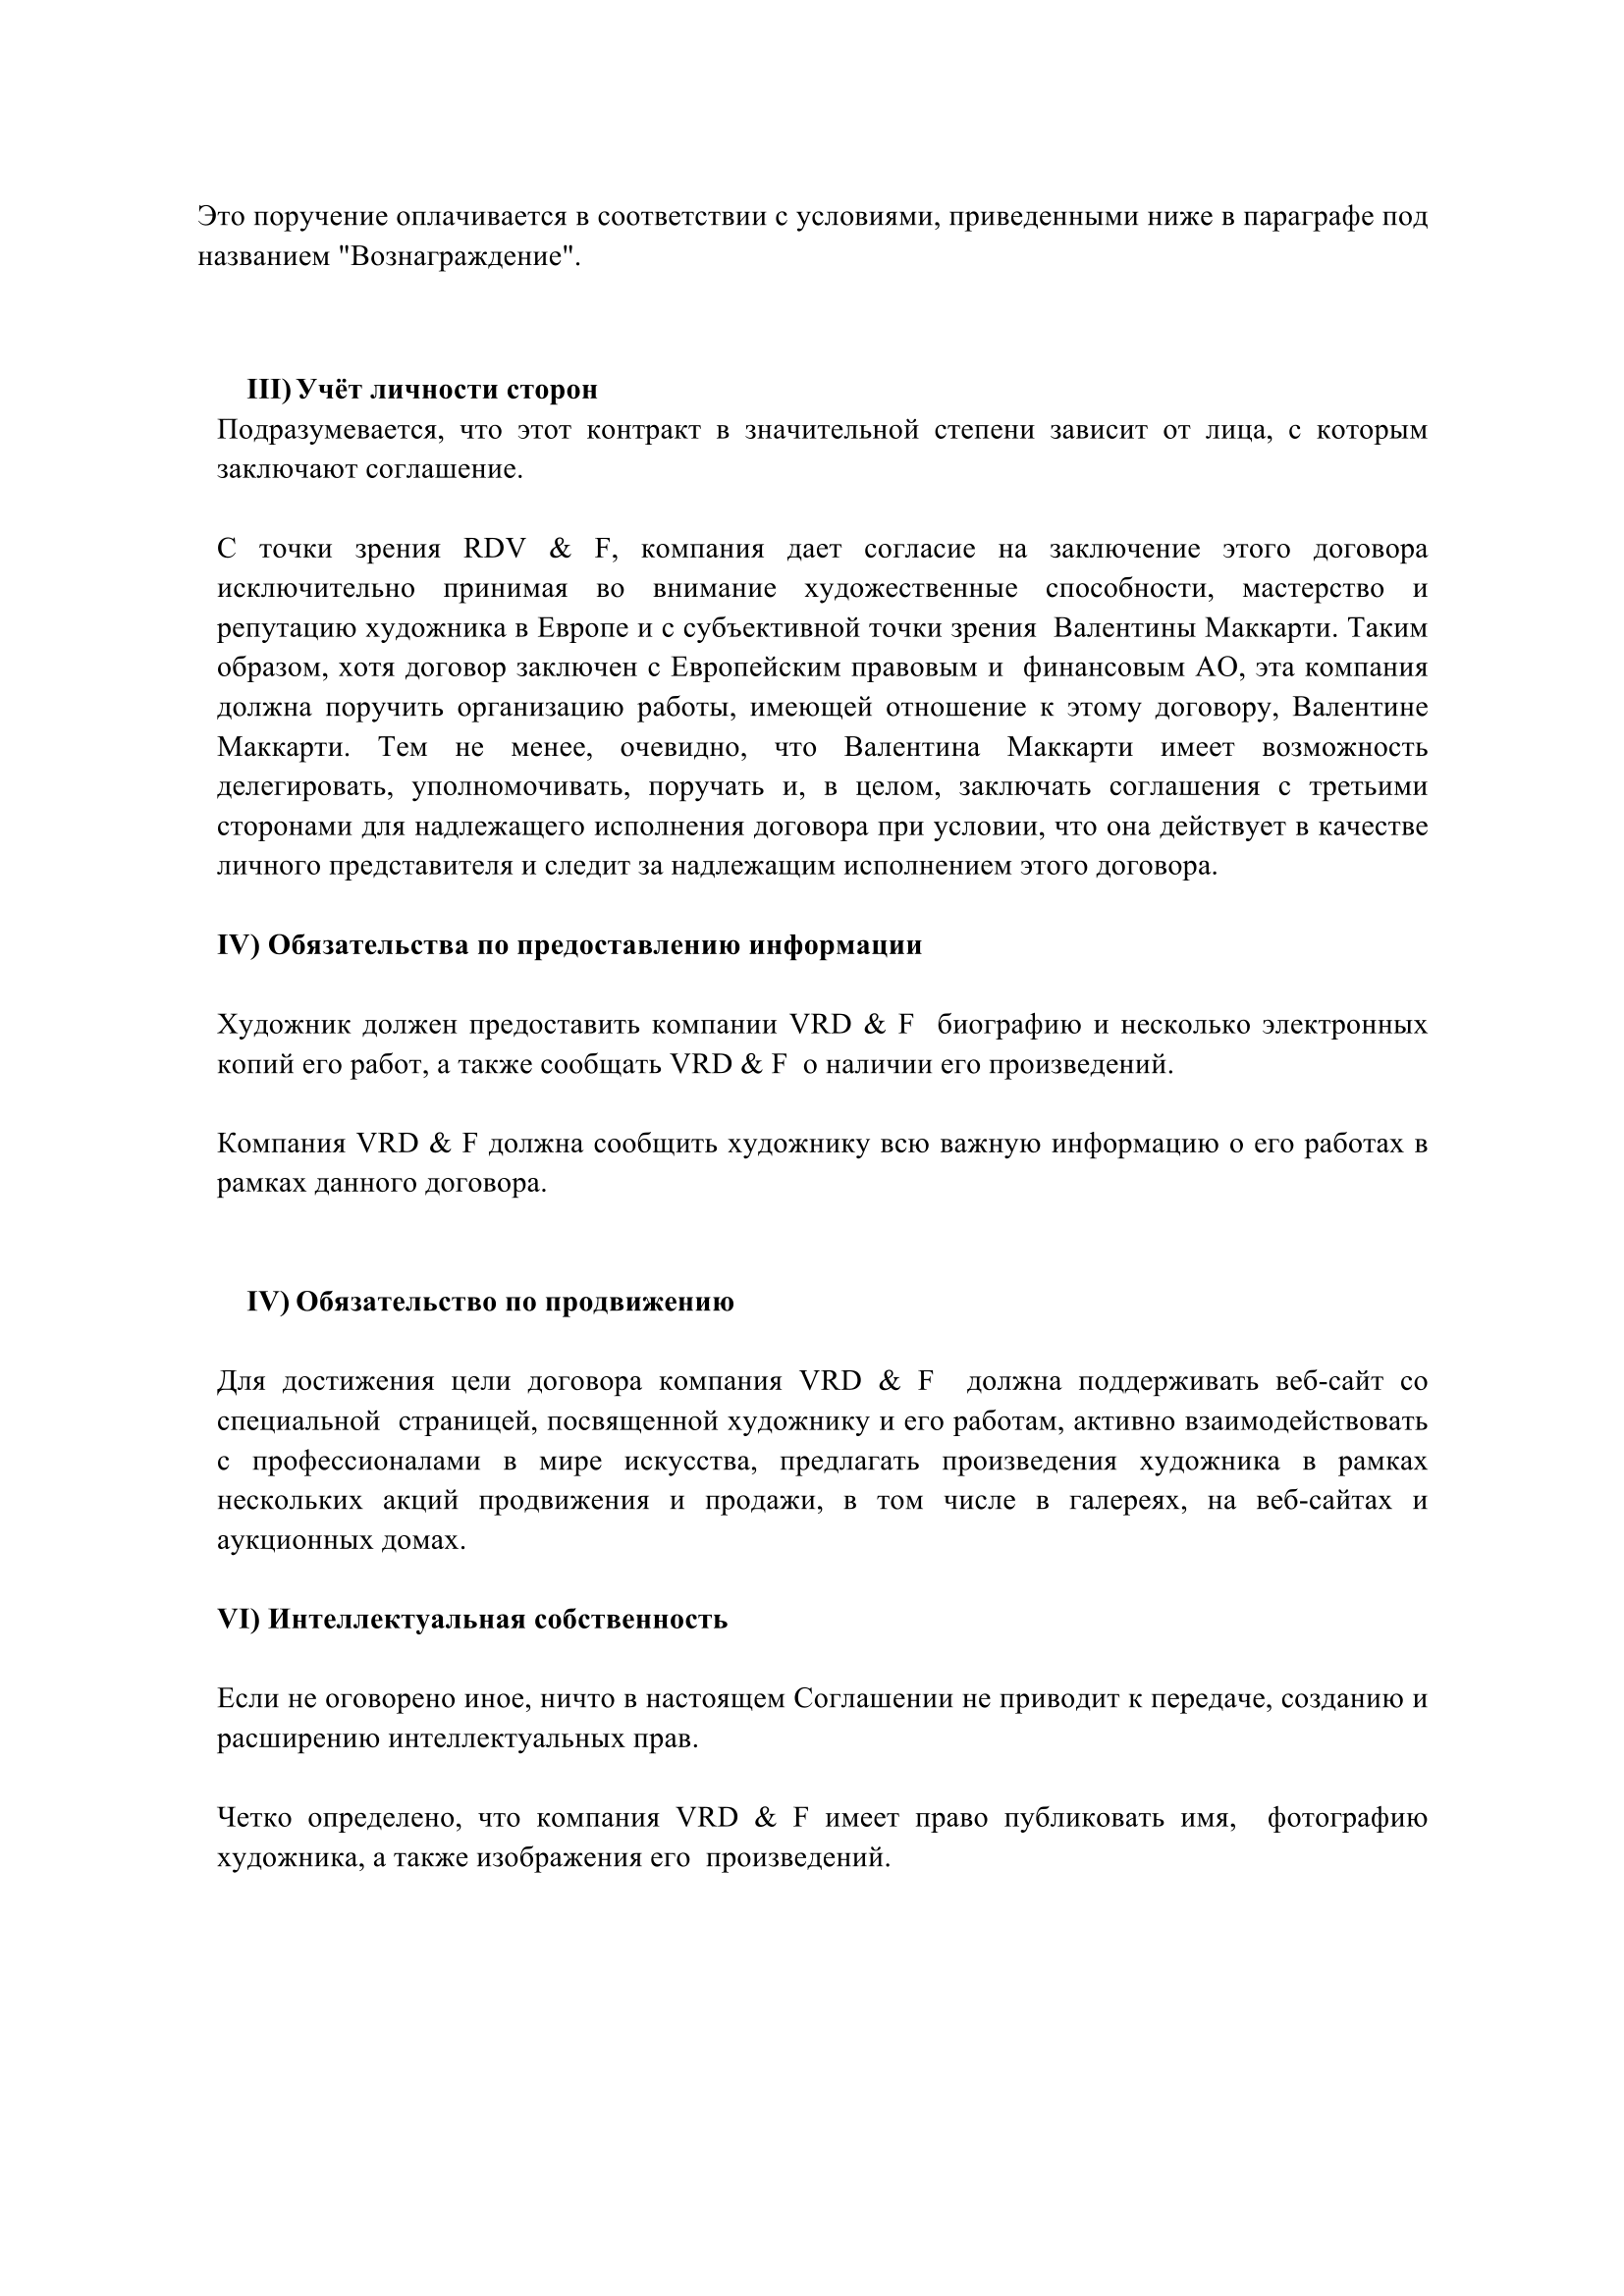 Mandat - Artistes - VRD_F - ру-2